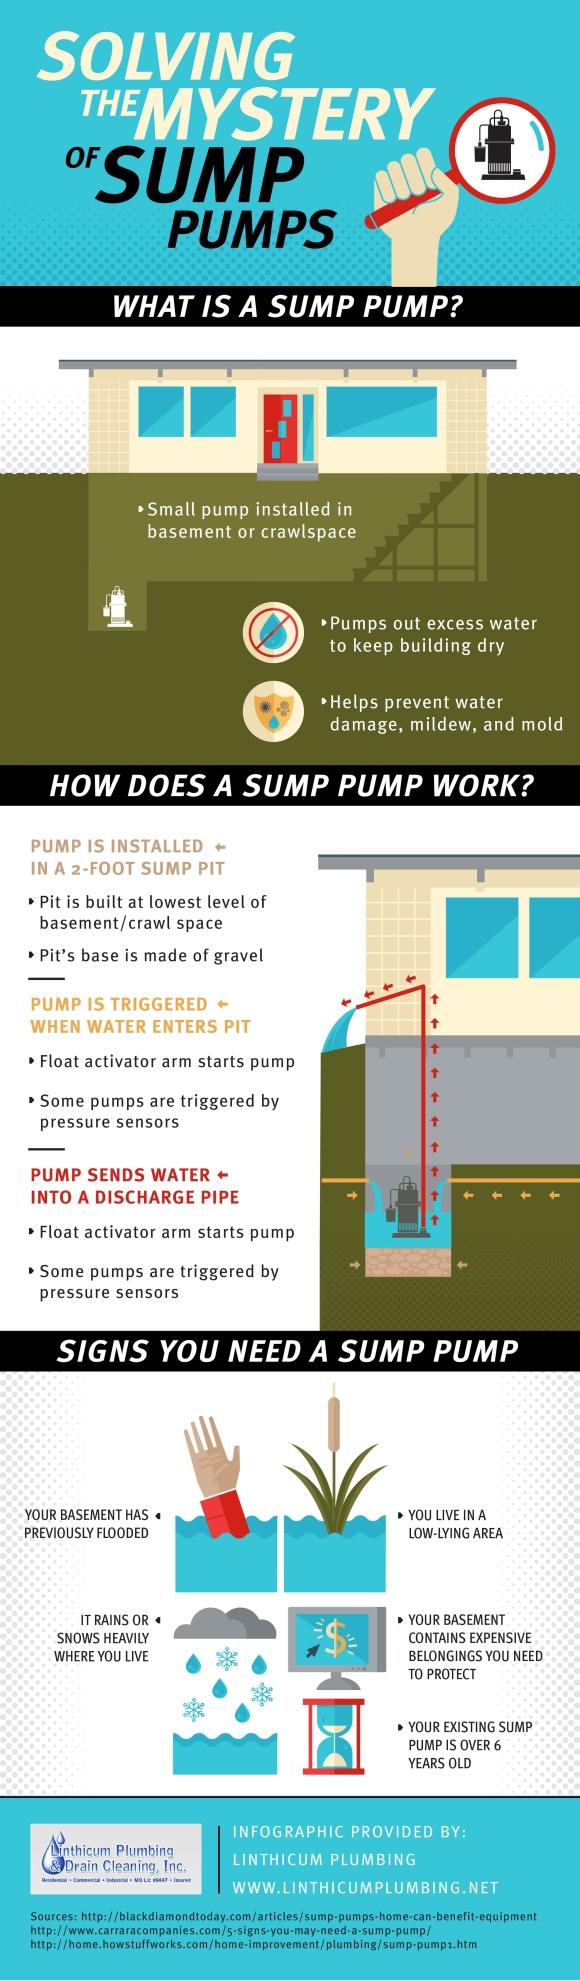 mystery-sump-pumps.jpg